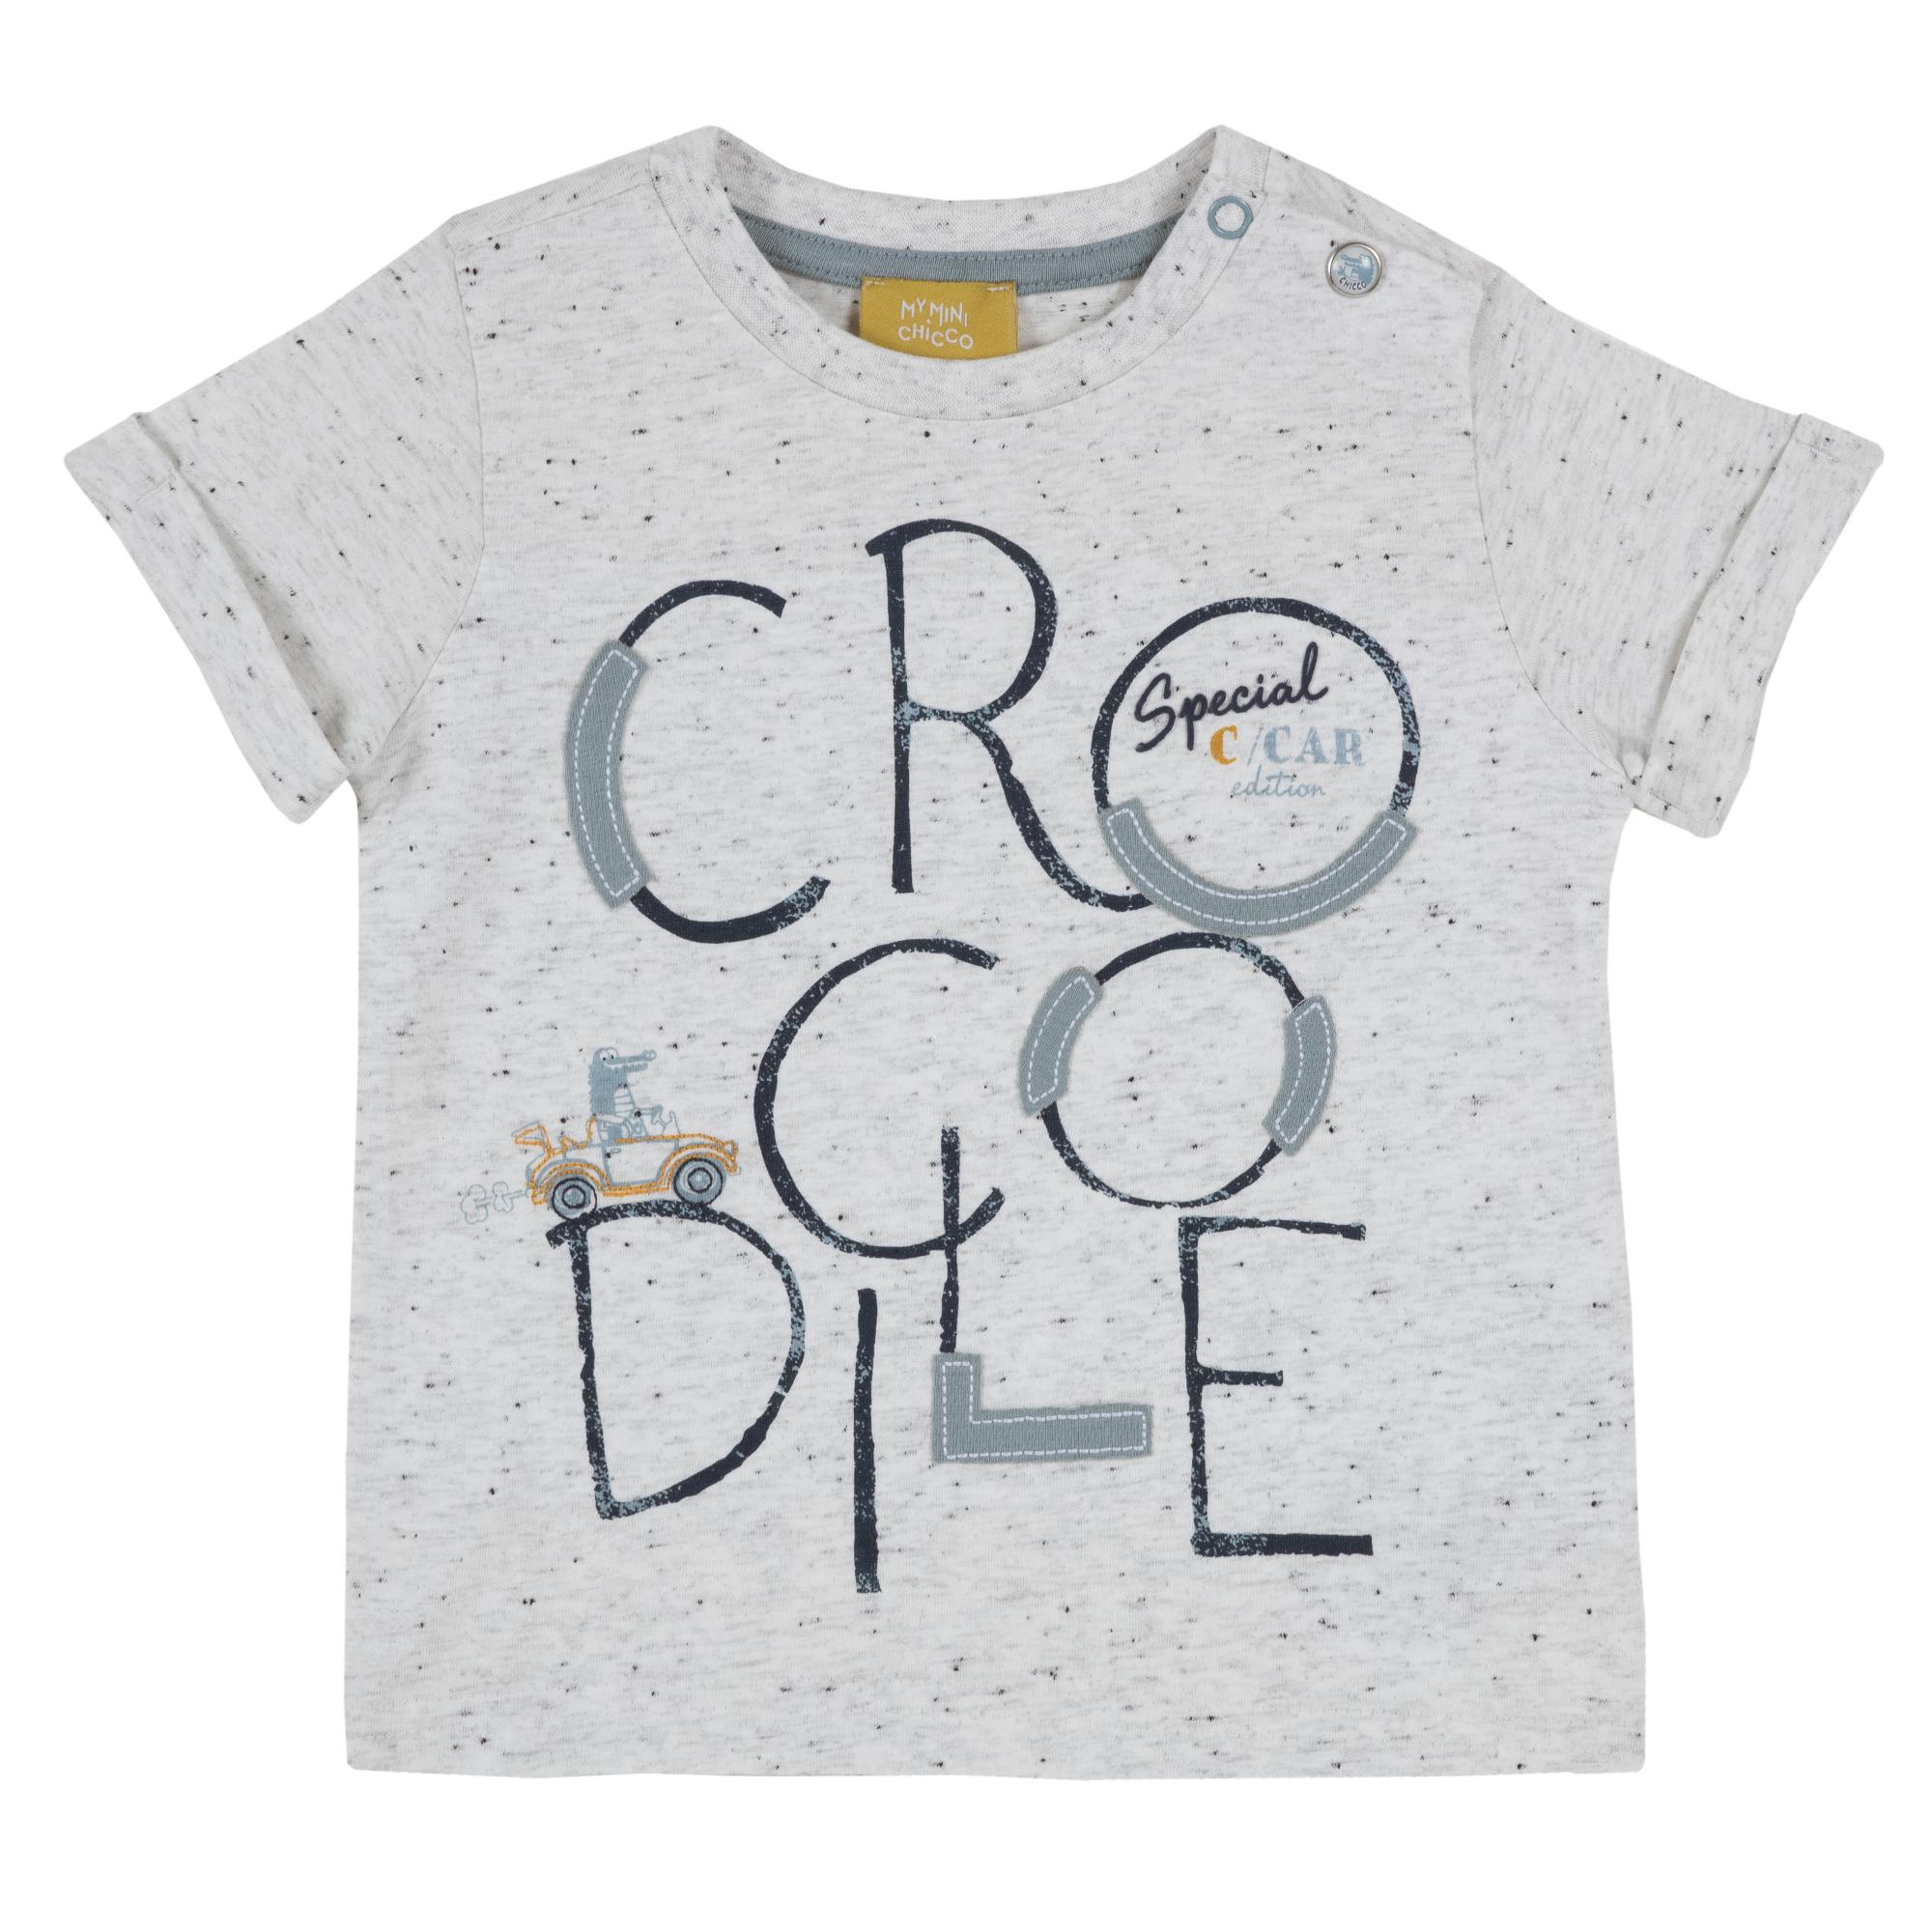 Tricou copii Chicco, maneca scurta, bej, 06554 din categoria Tricouri copii